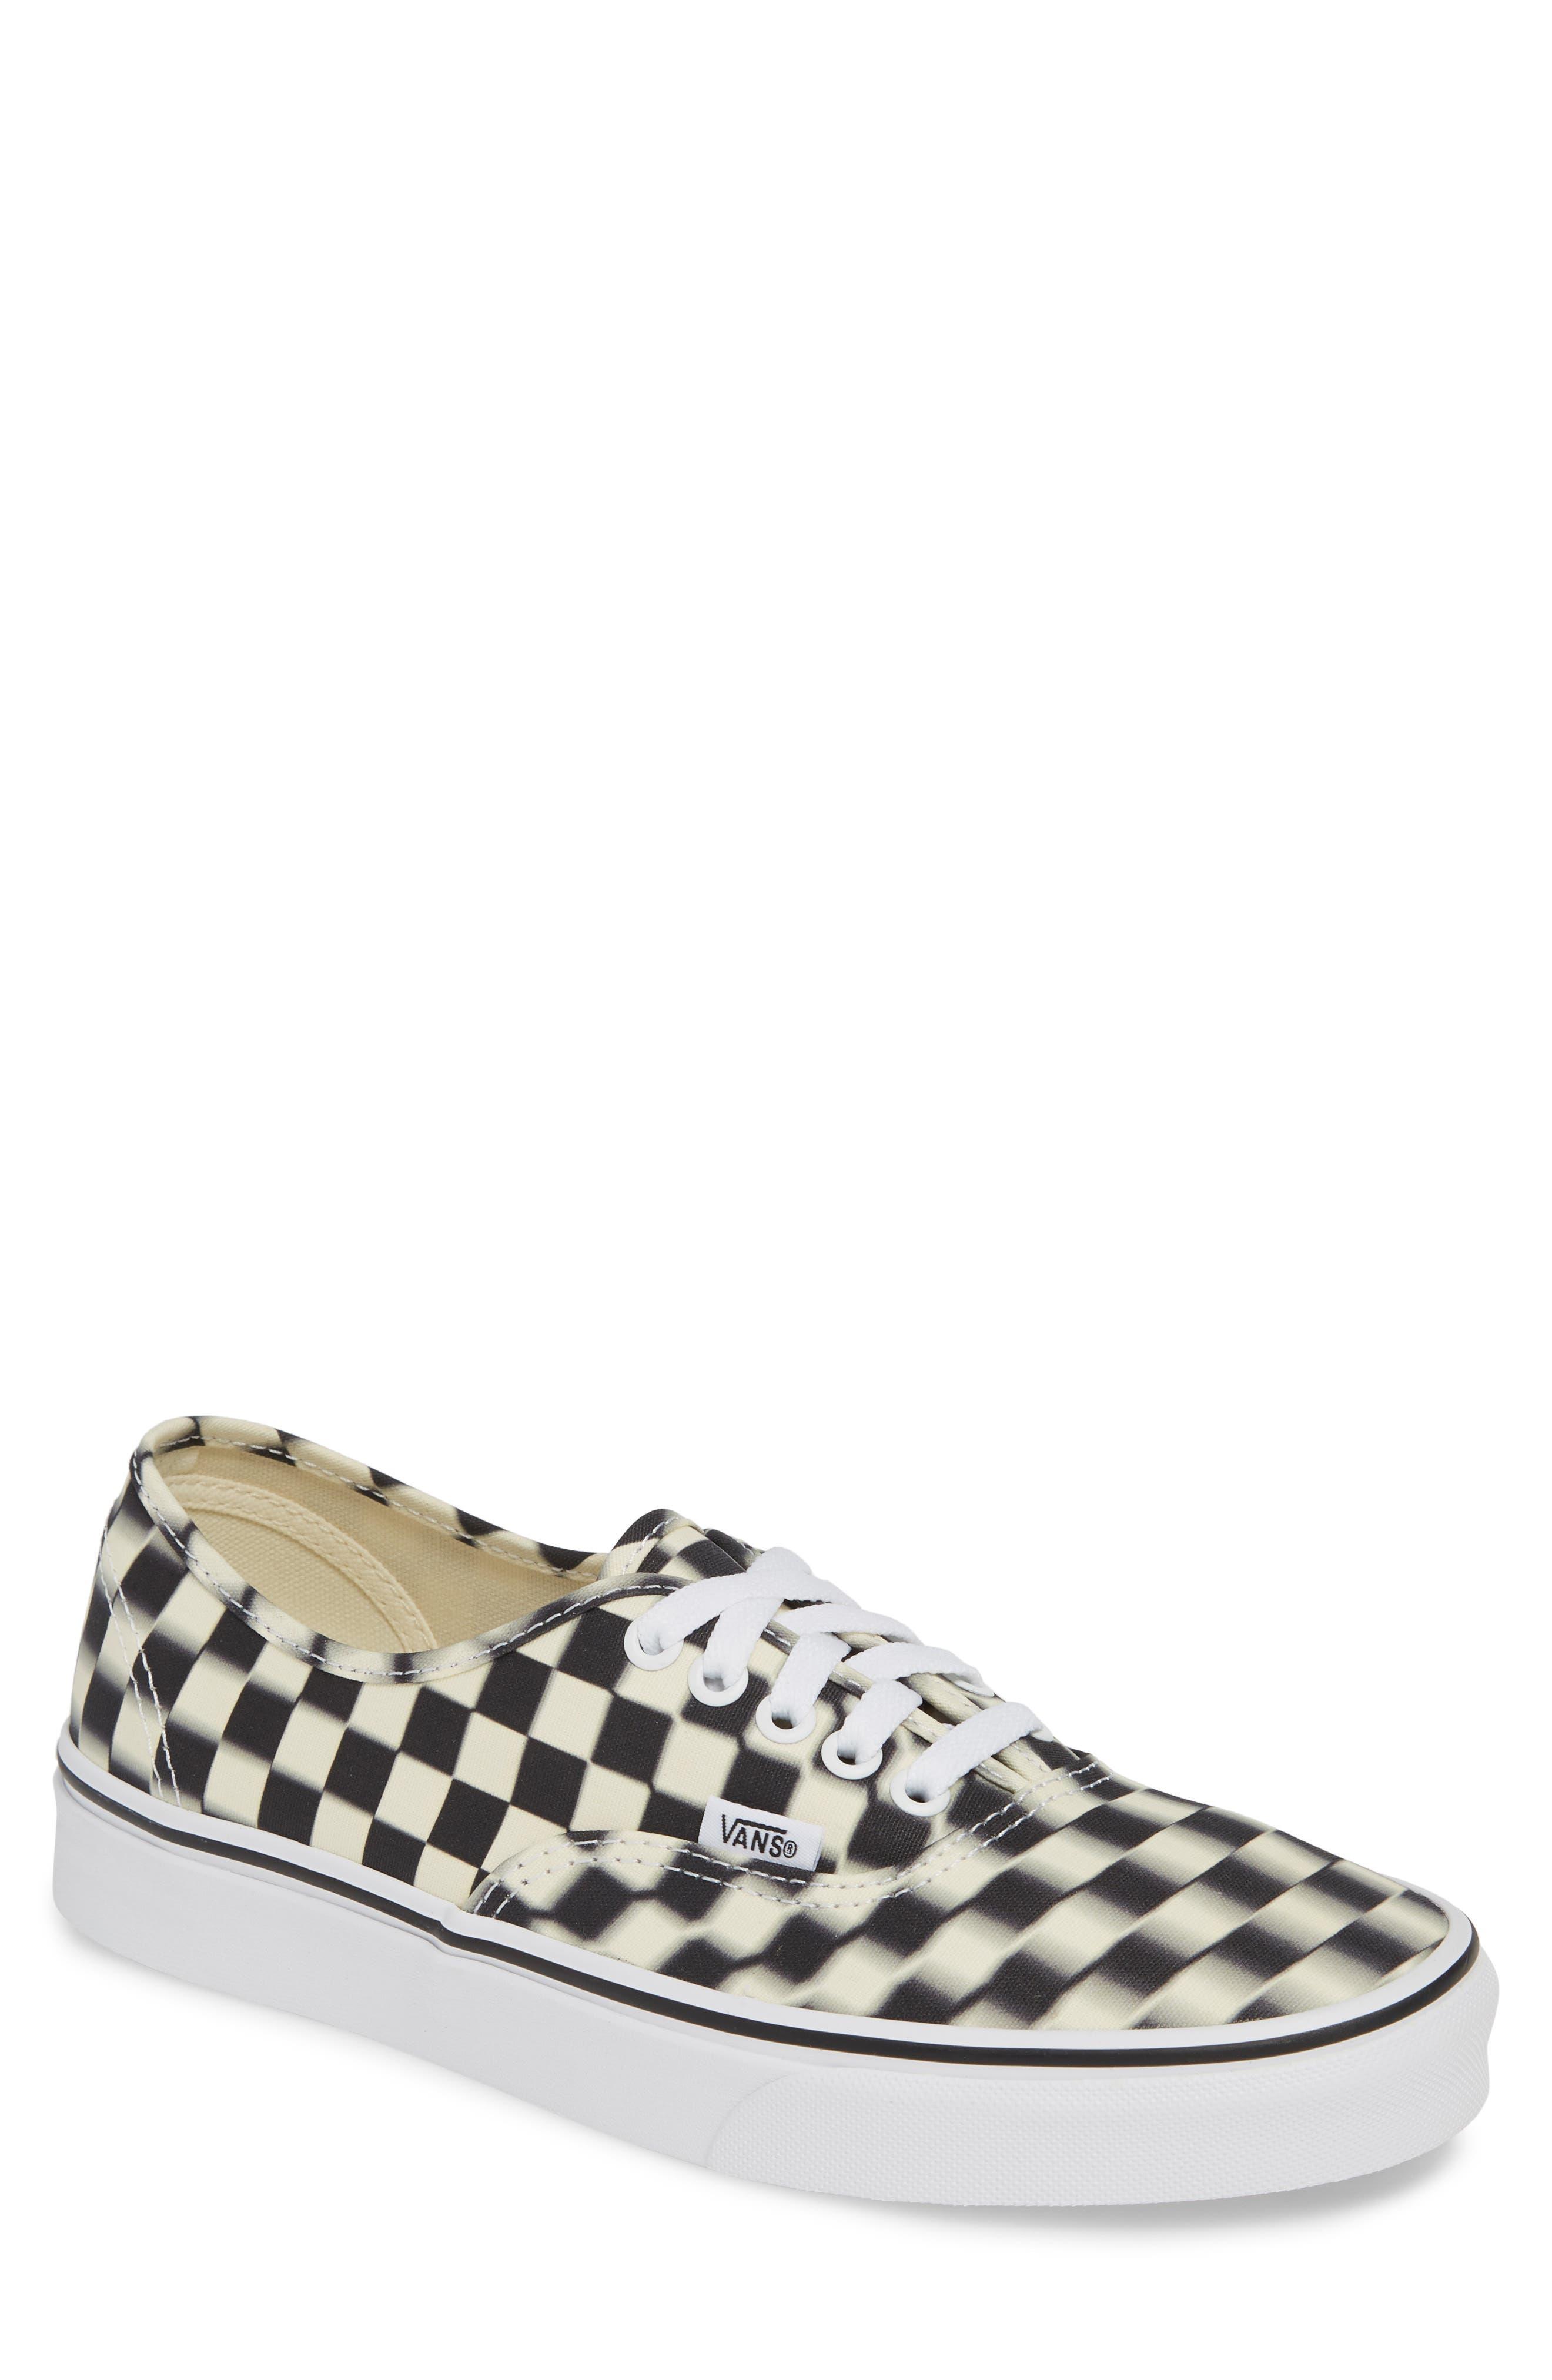 VANS UA Authentic Sneaker, Main, color, BLACK/ CLASSIC WHITE CHECK